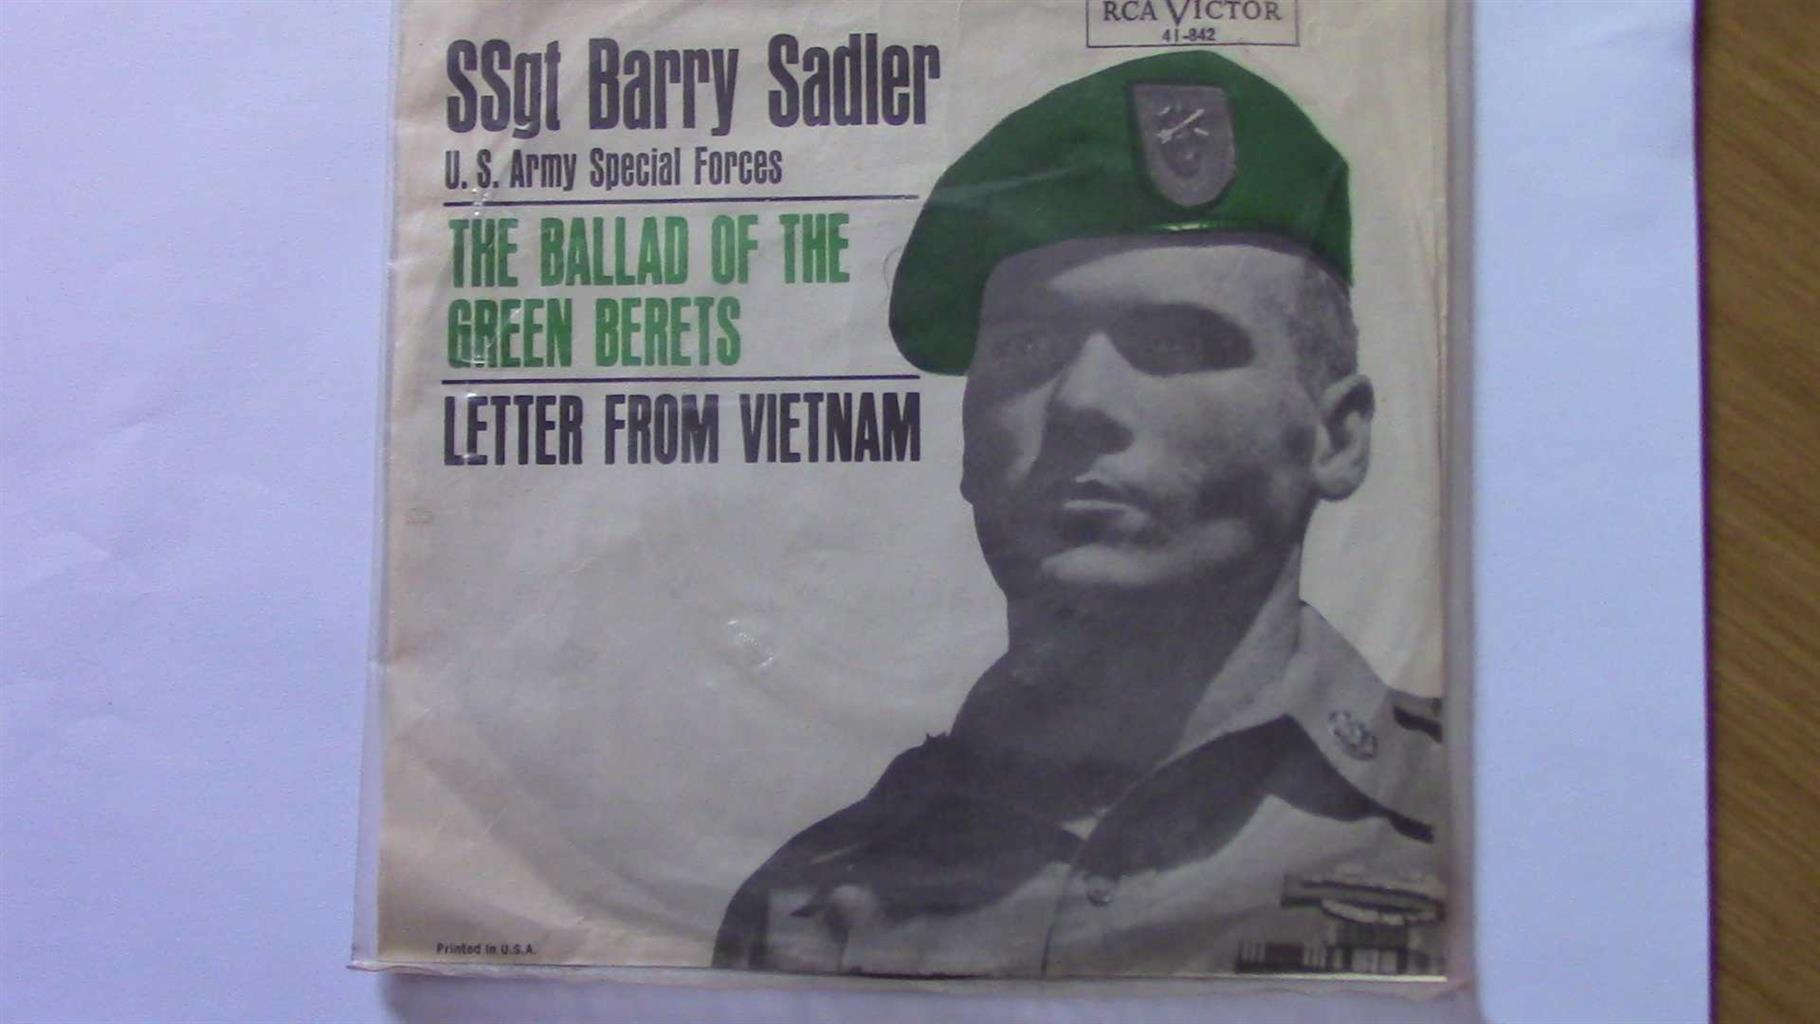 Rare Vinyl Seven Singles (71 - 82)